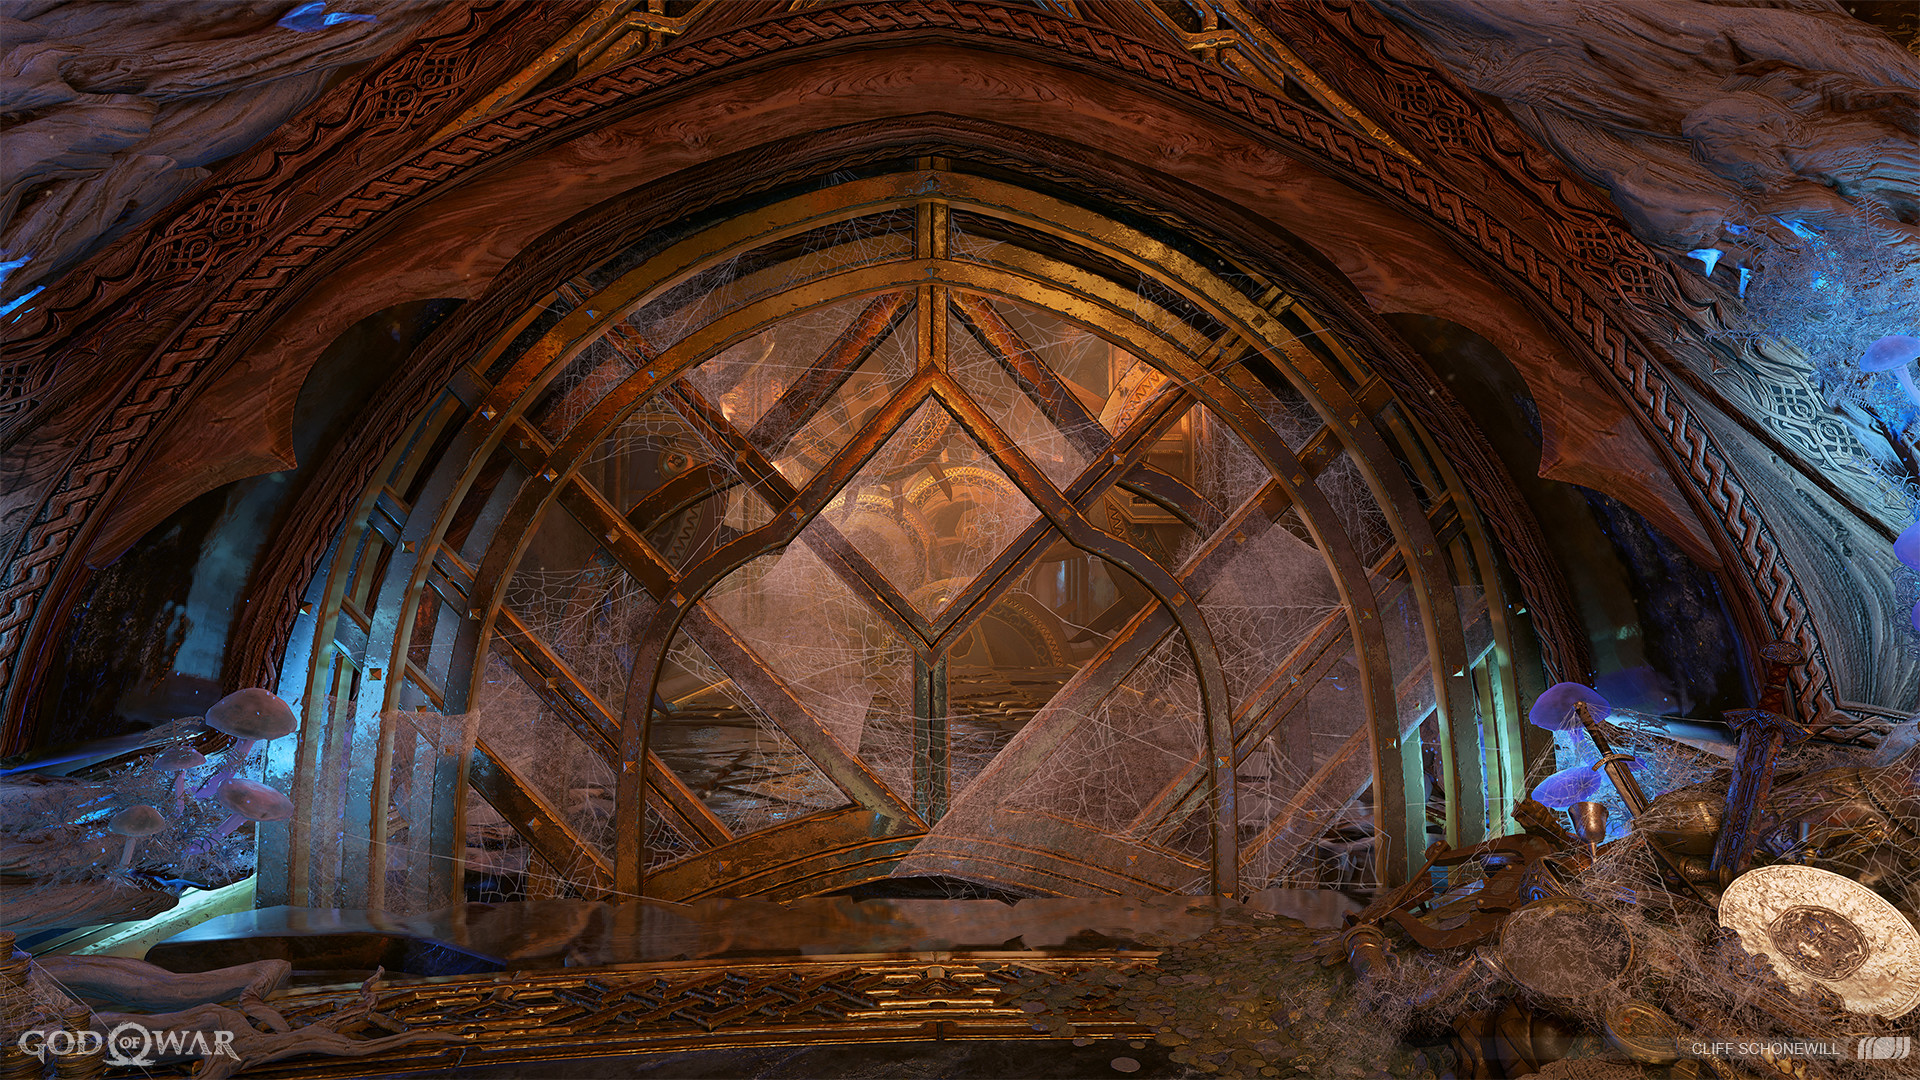 Cliff schonewill tyrsvault vaultrooms 06